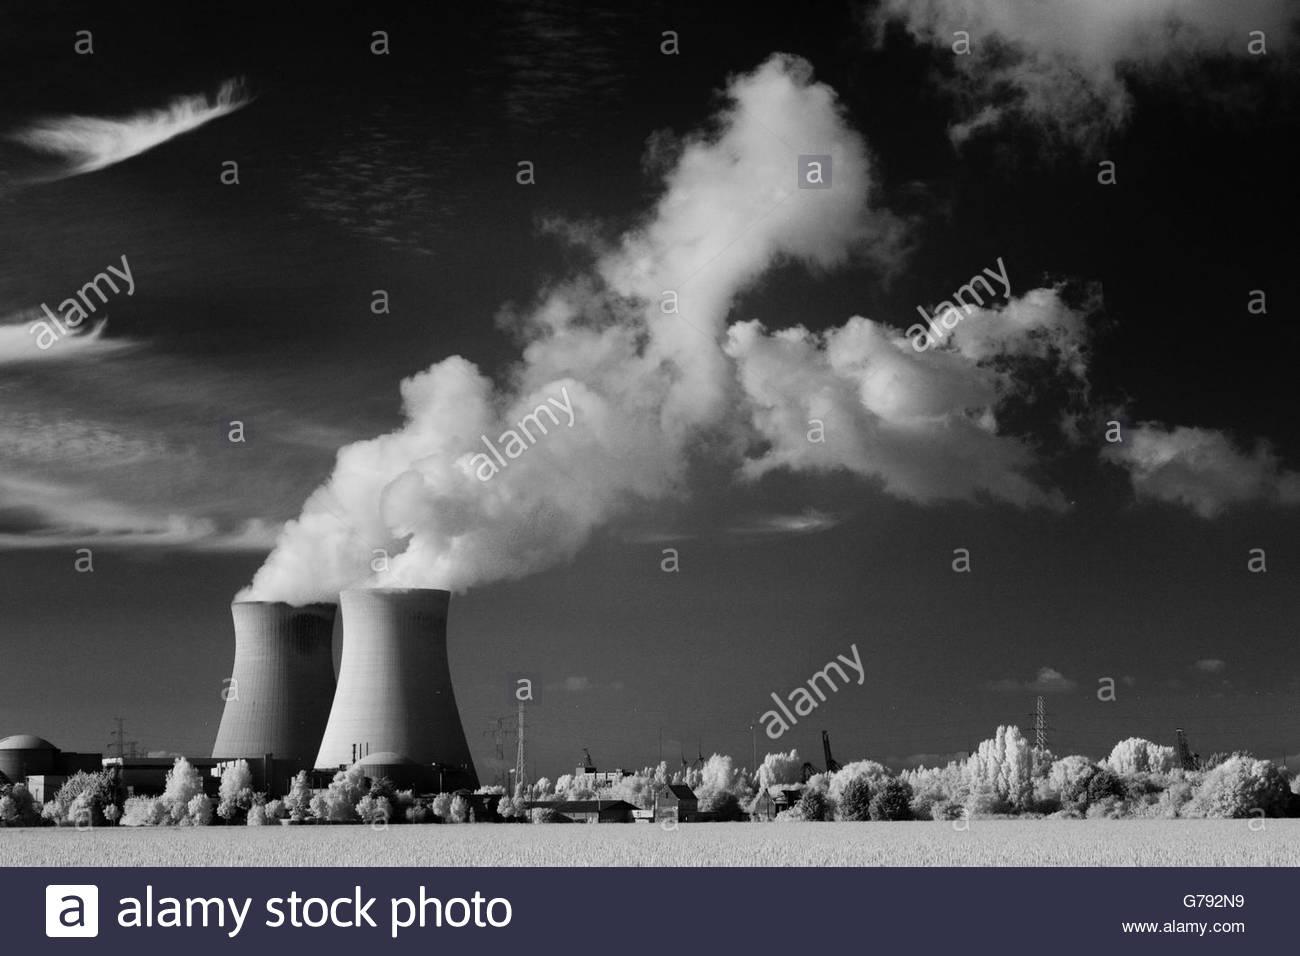 nuclear power plant Doel, Belgium - Stock Image